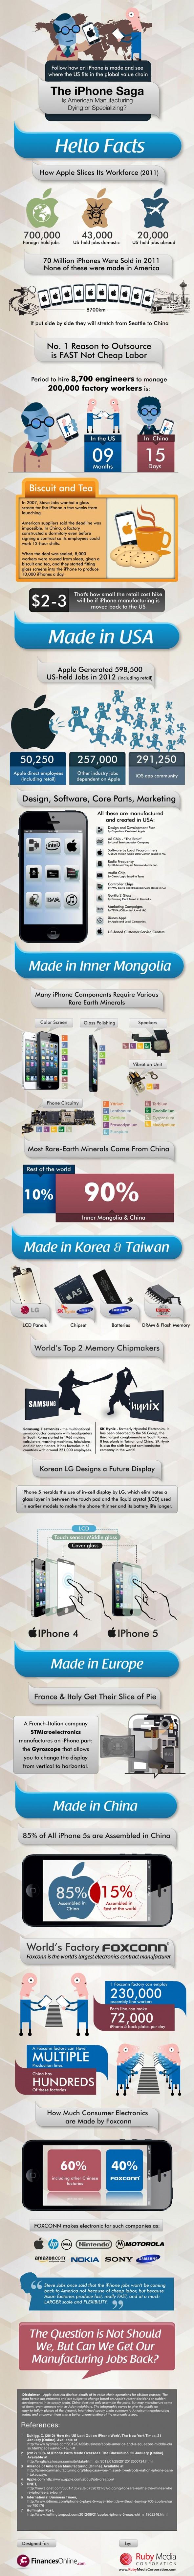 iPhone-manufacturing